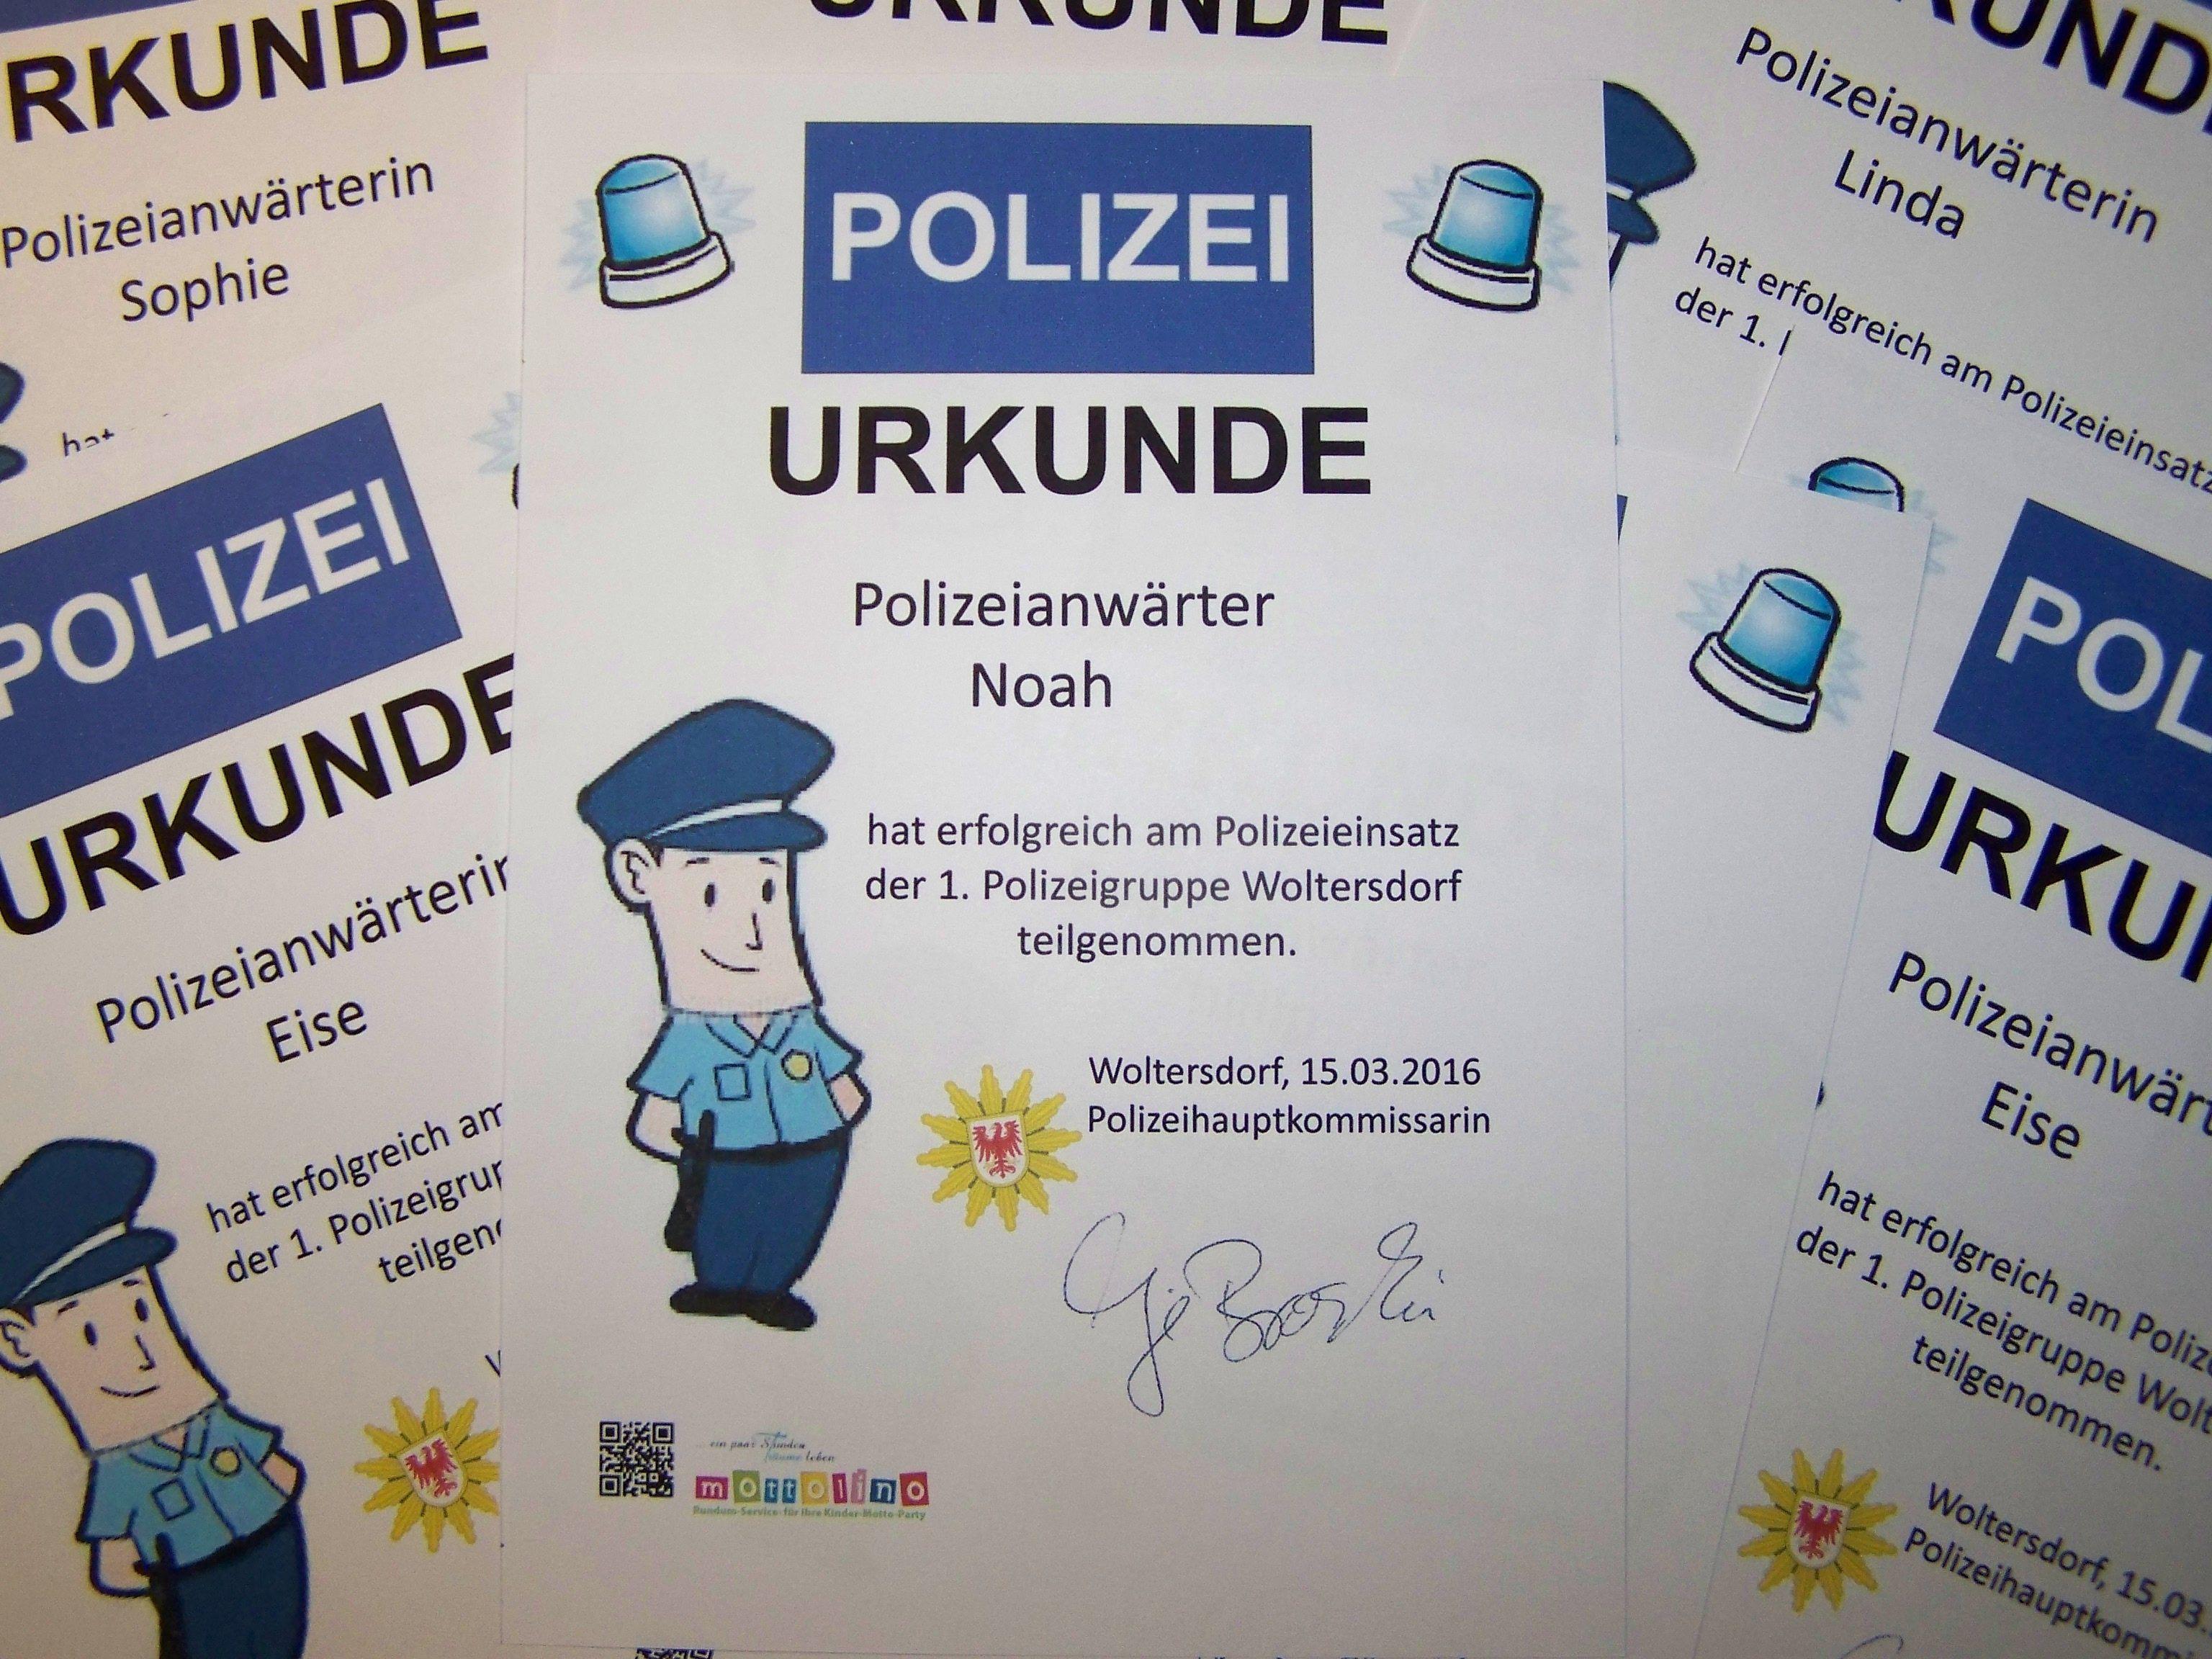 Polizei Urkunde Www.mottolino.de